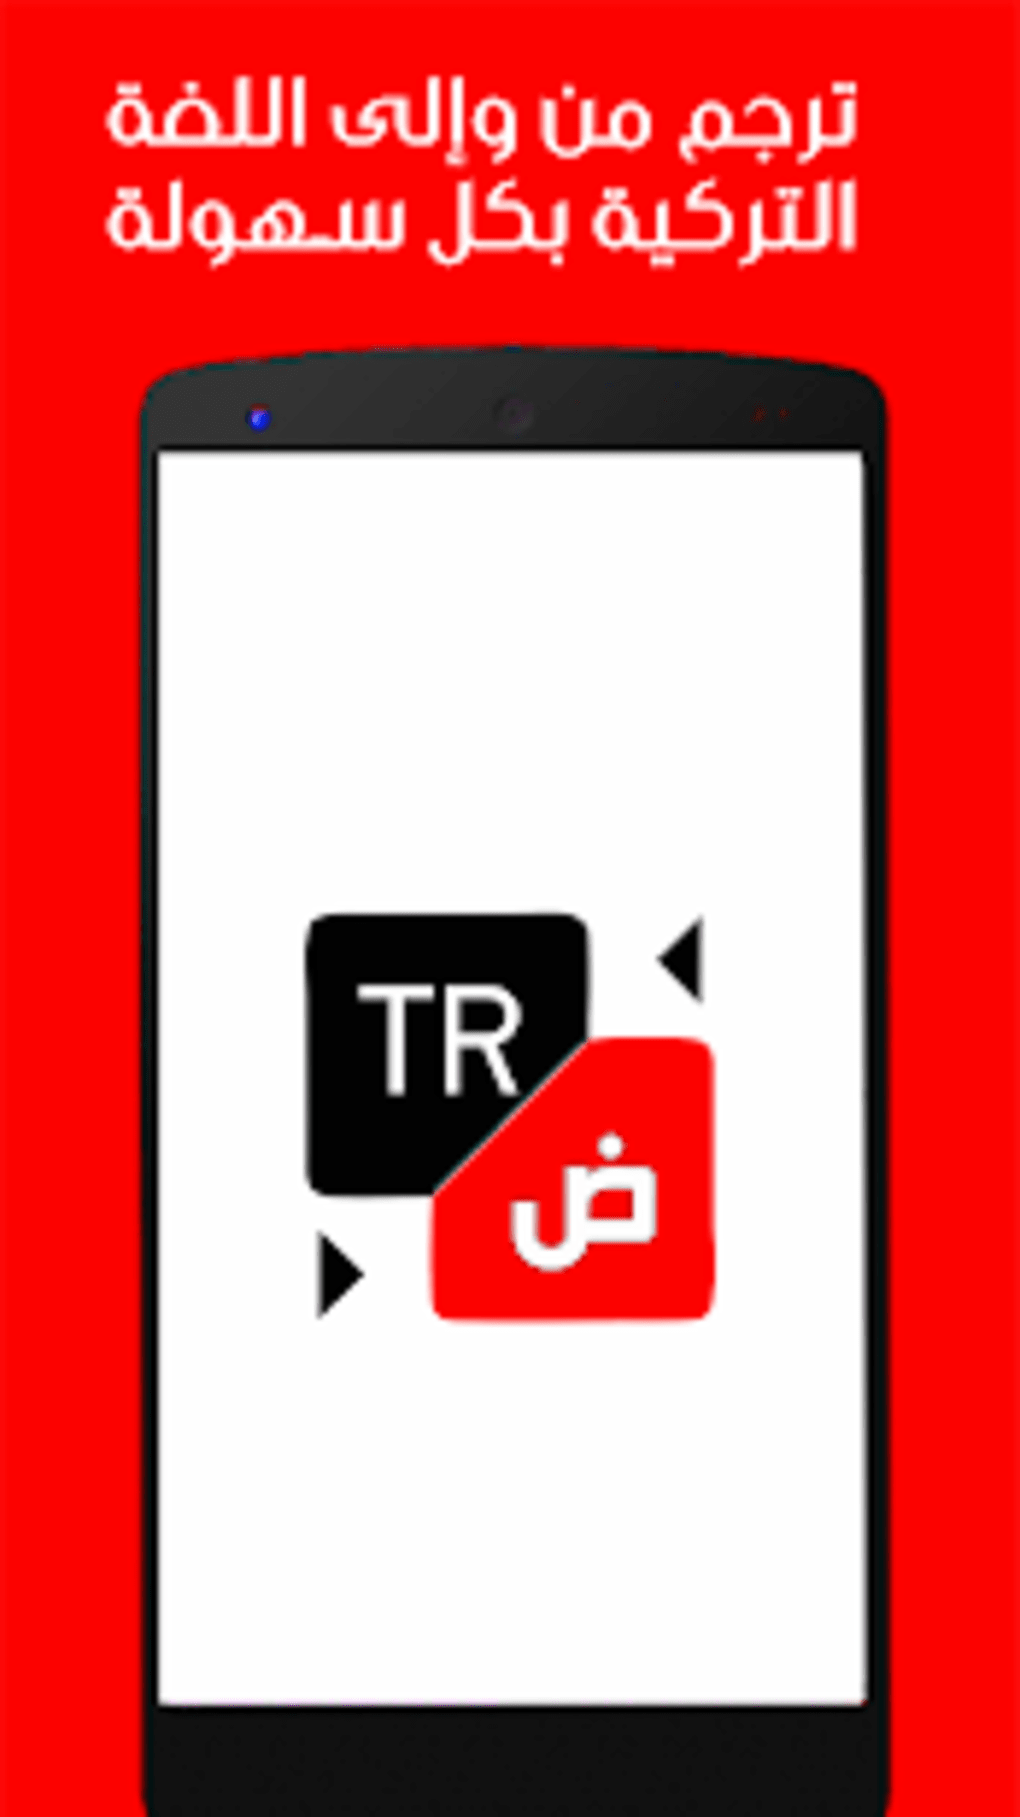 مترجم عربي تركي ناطق وبالعكس Apk For Android Download